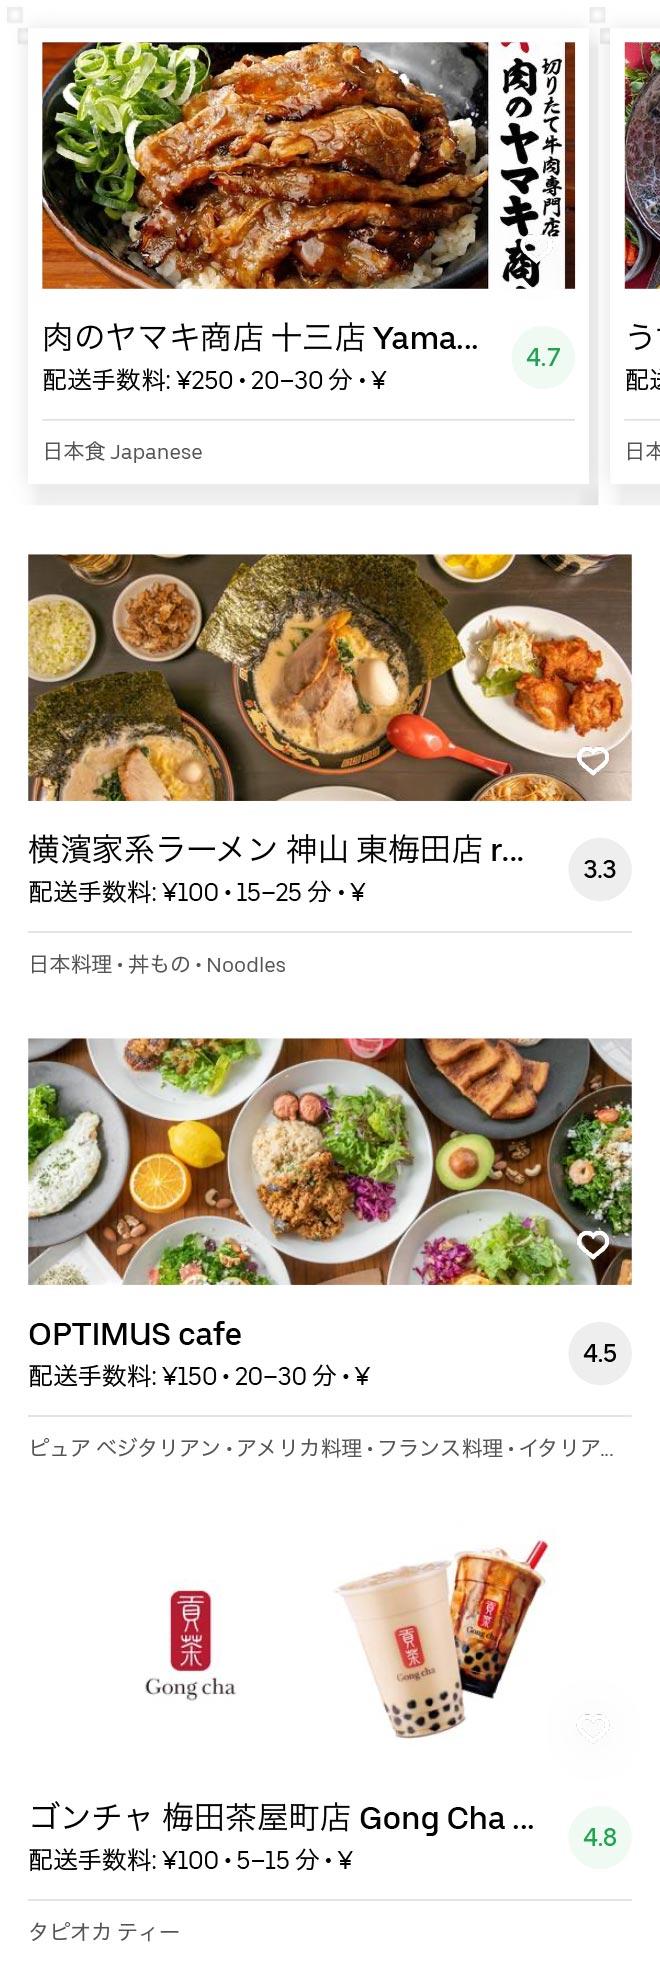 Osaka umeda menu 2005 02